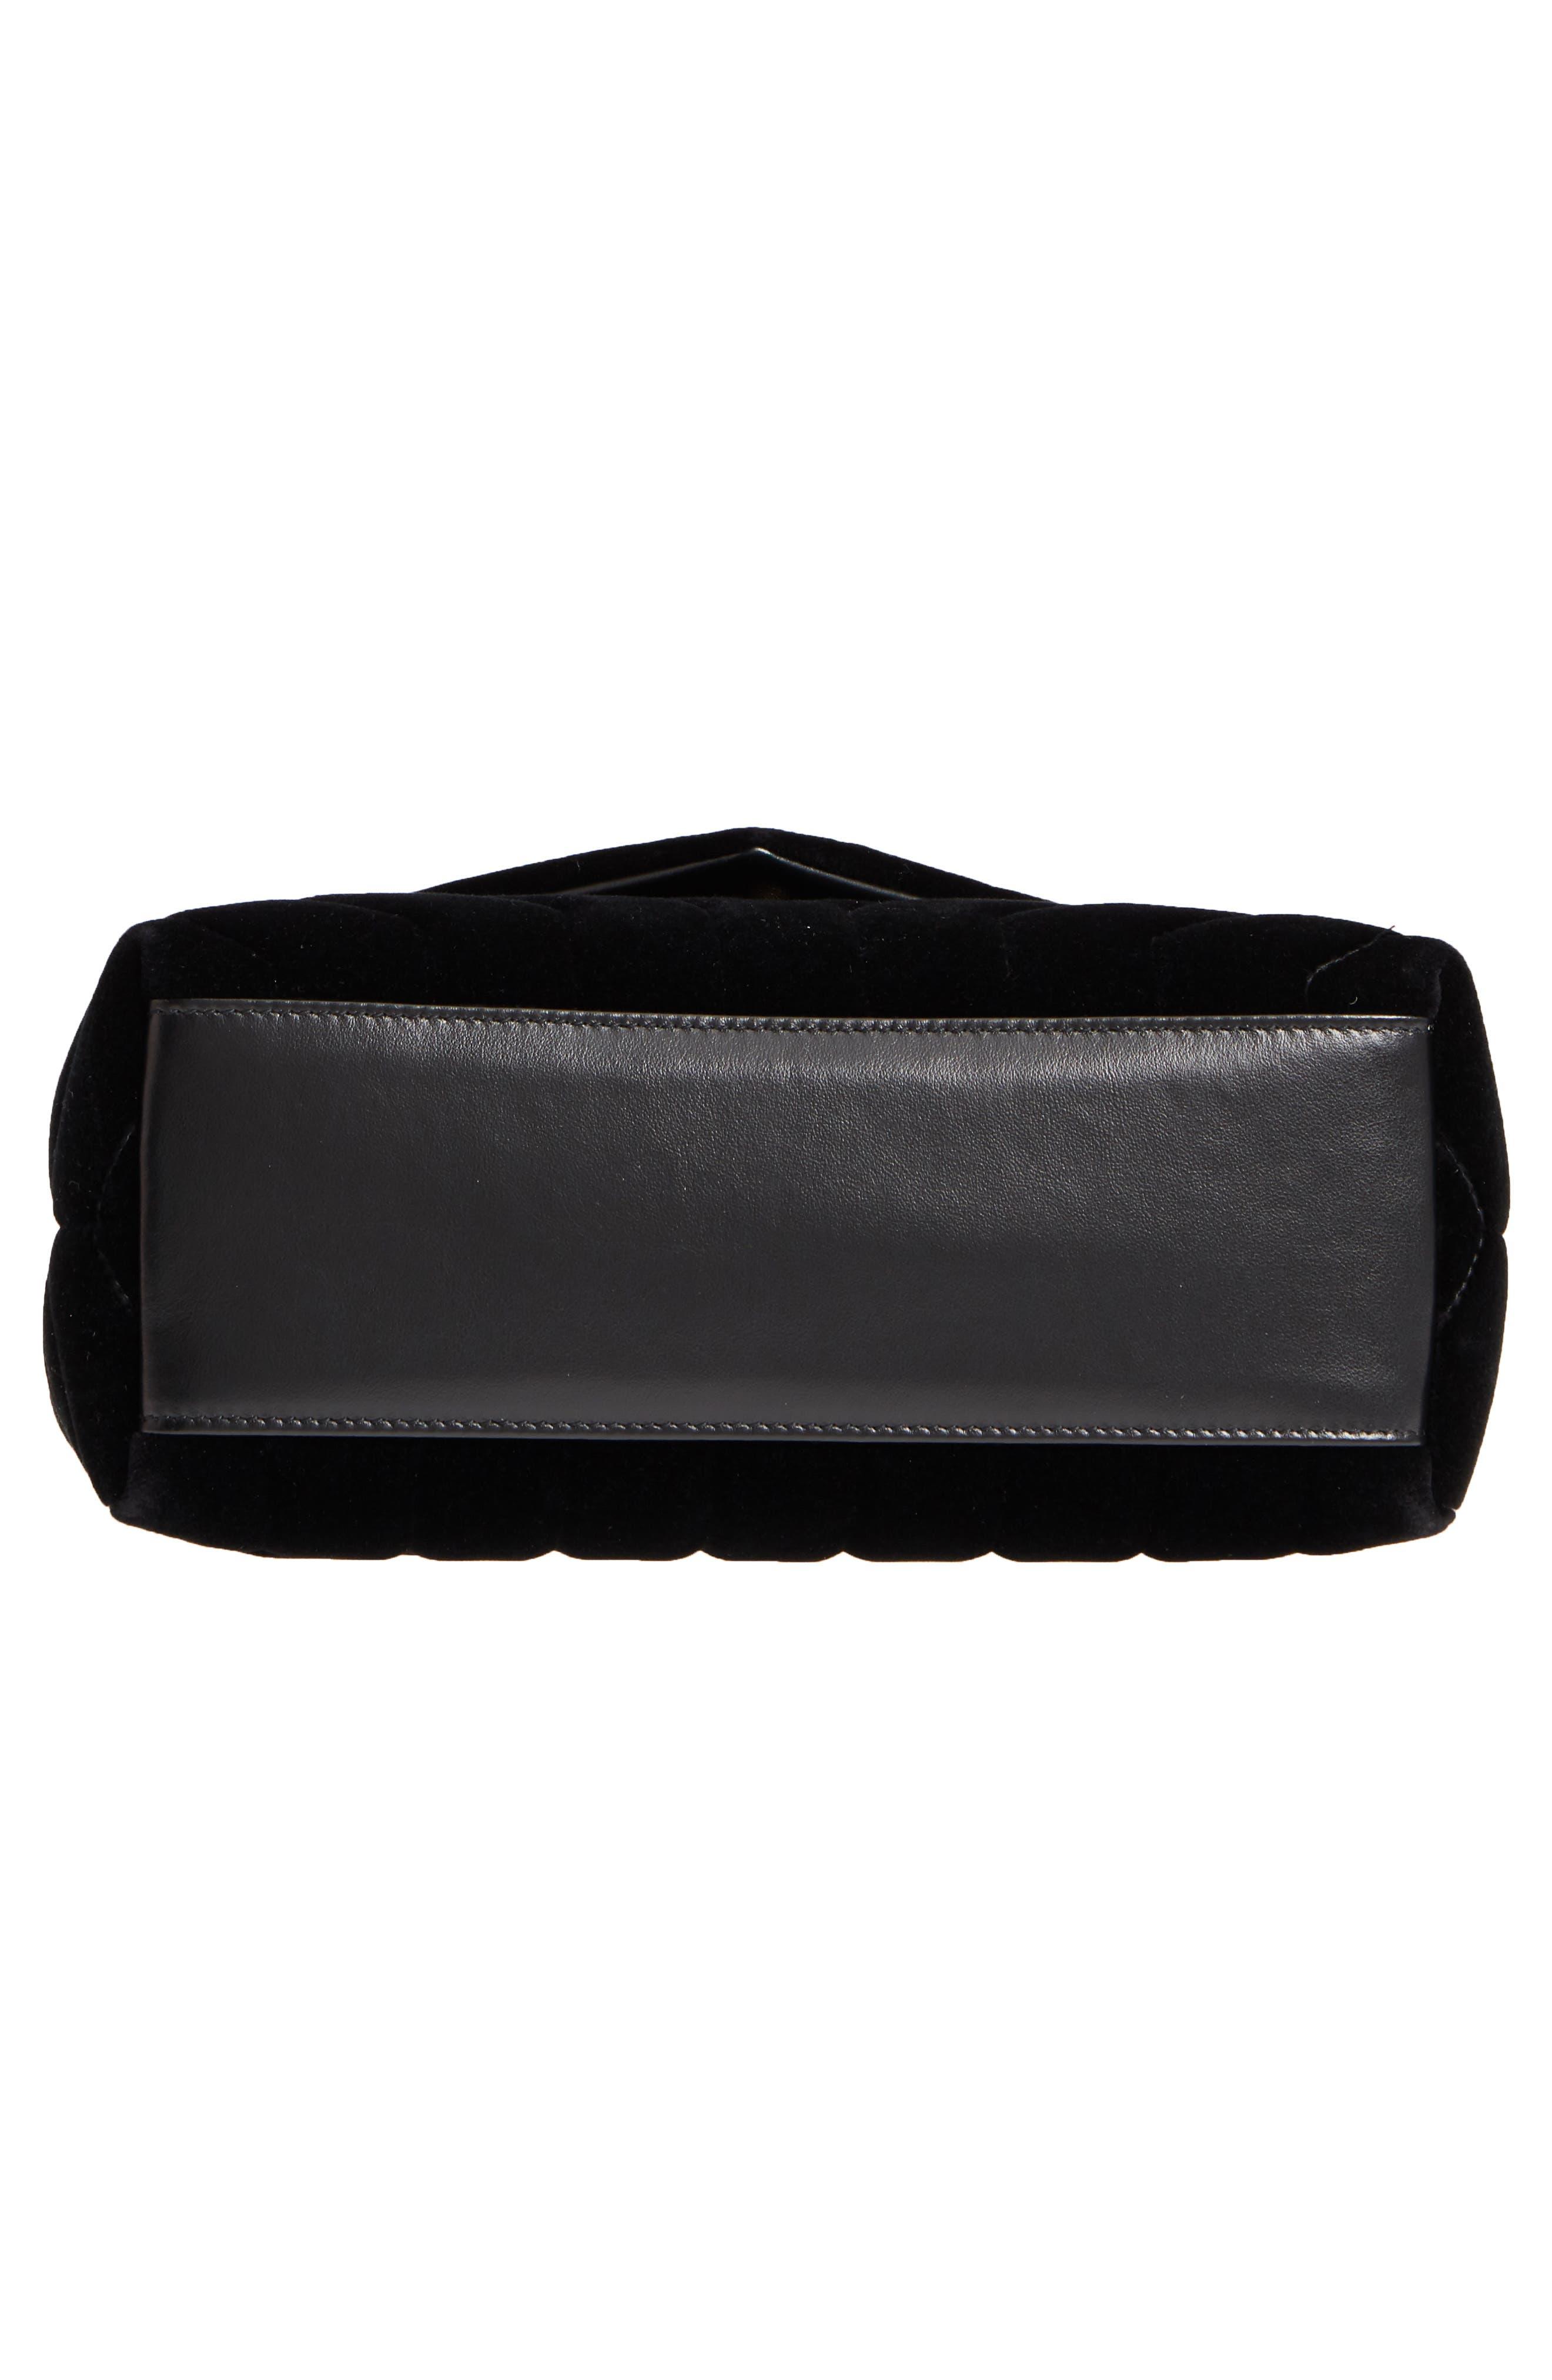 SAINT LAURENT,                             Small Loulou Velvet Shoulder Bag,                             Alternate thumbnail 6, color,                             NERO/ NERO/ NERO